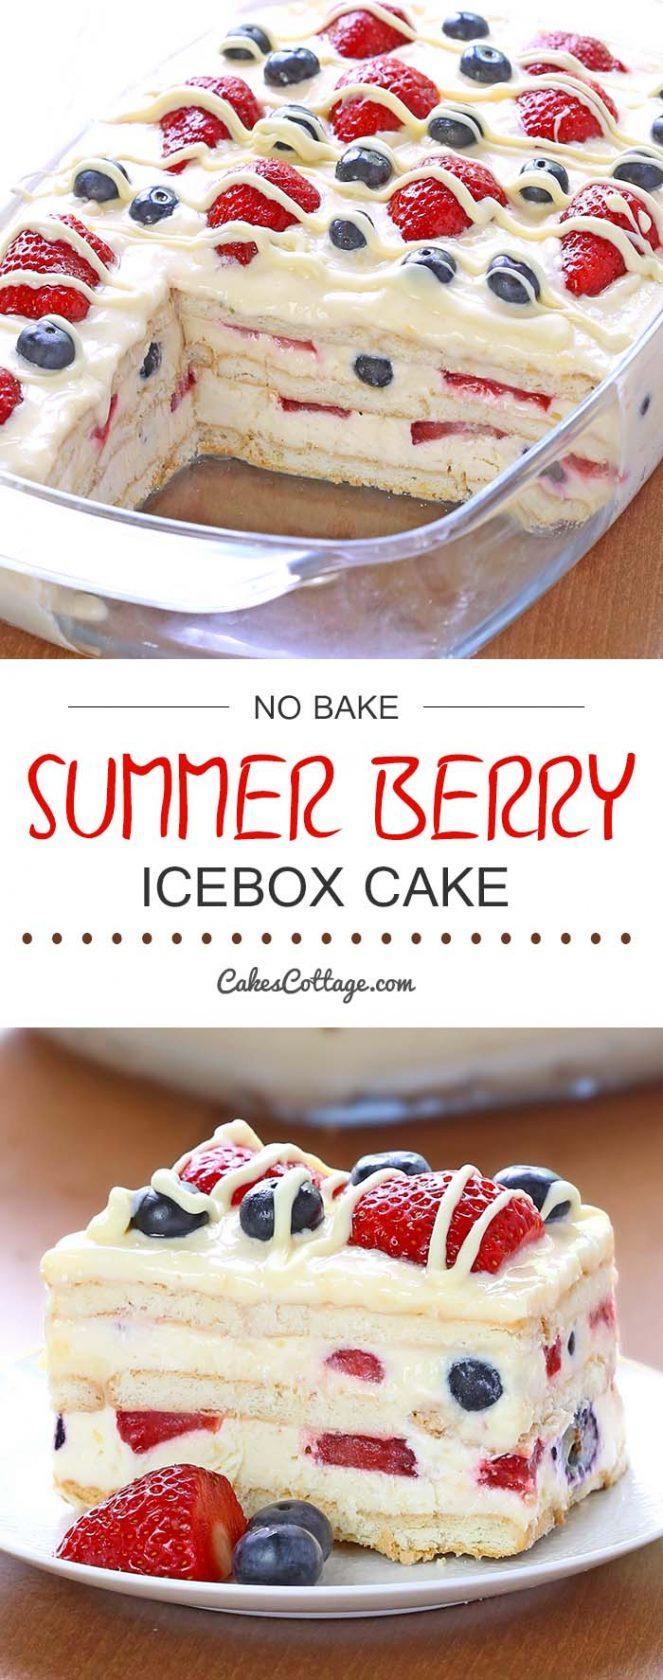 No-Bake Summer Berry Ice Box